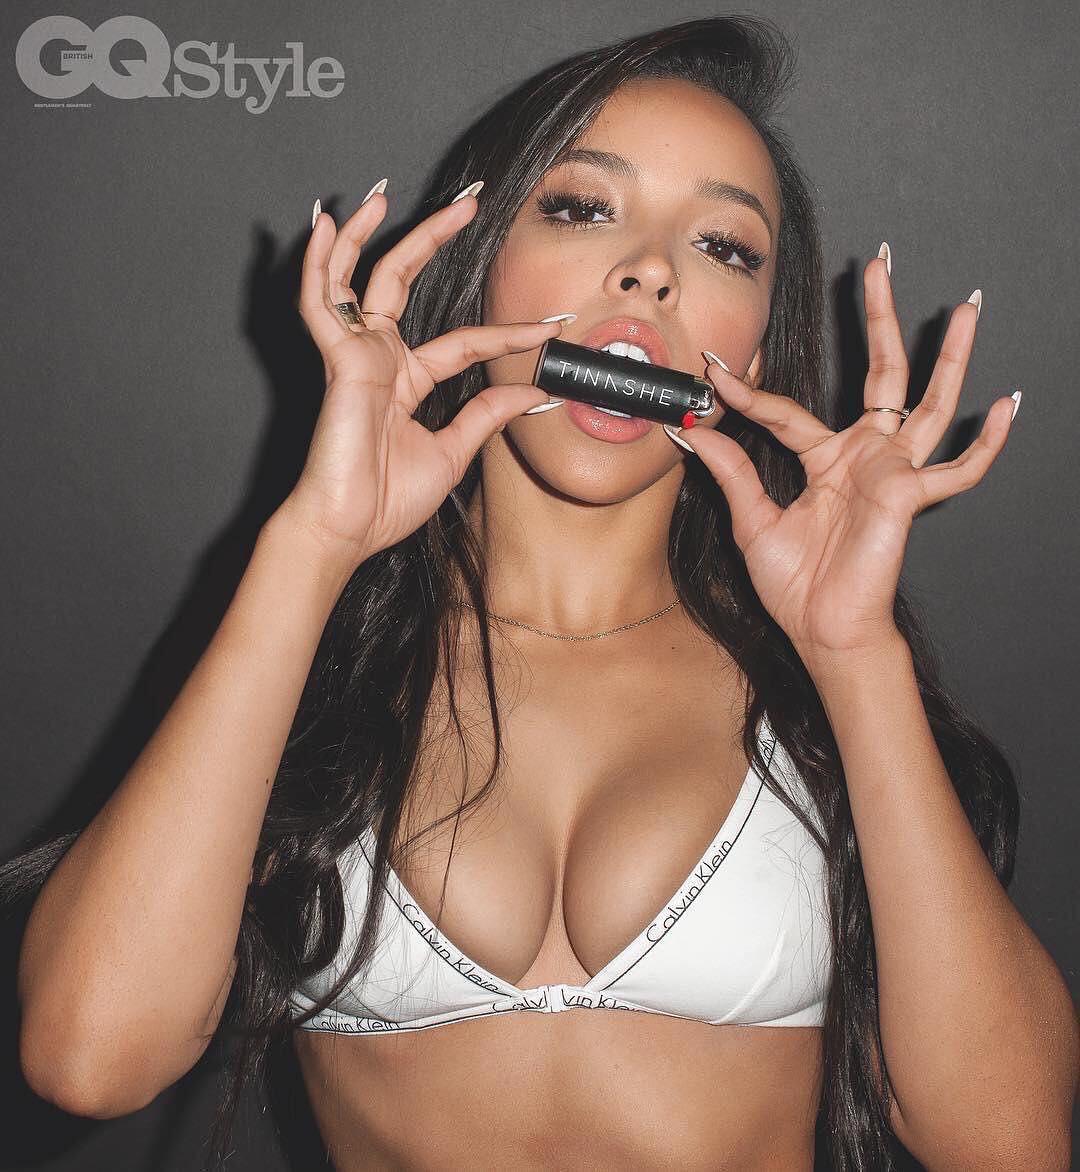 b1a90ac5d9a9 Tinashe & Travi$ Scott For GQ | ButIsItNEW